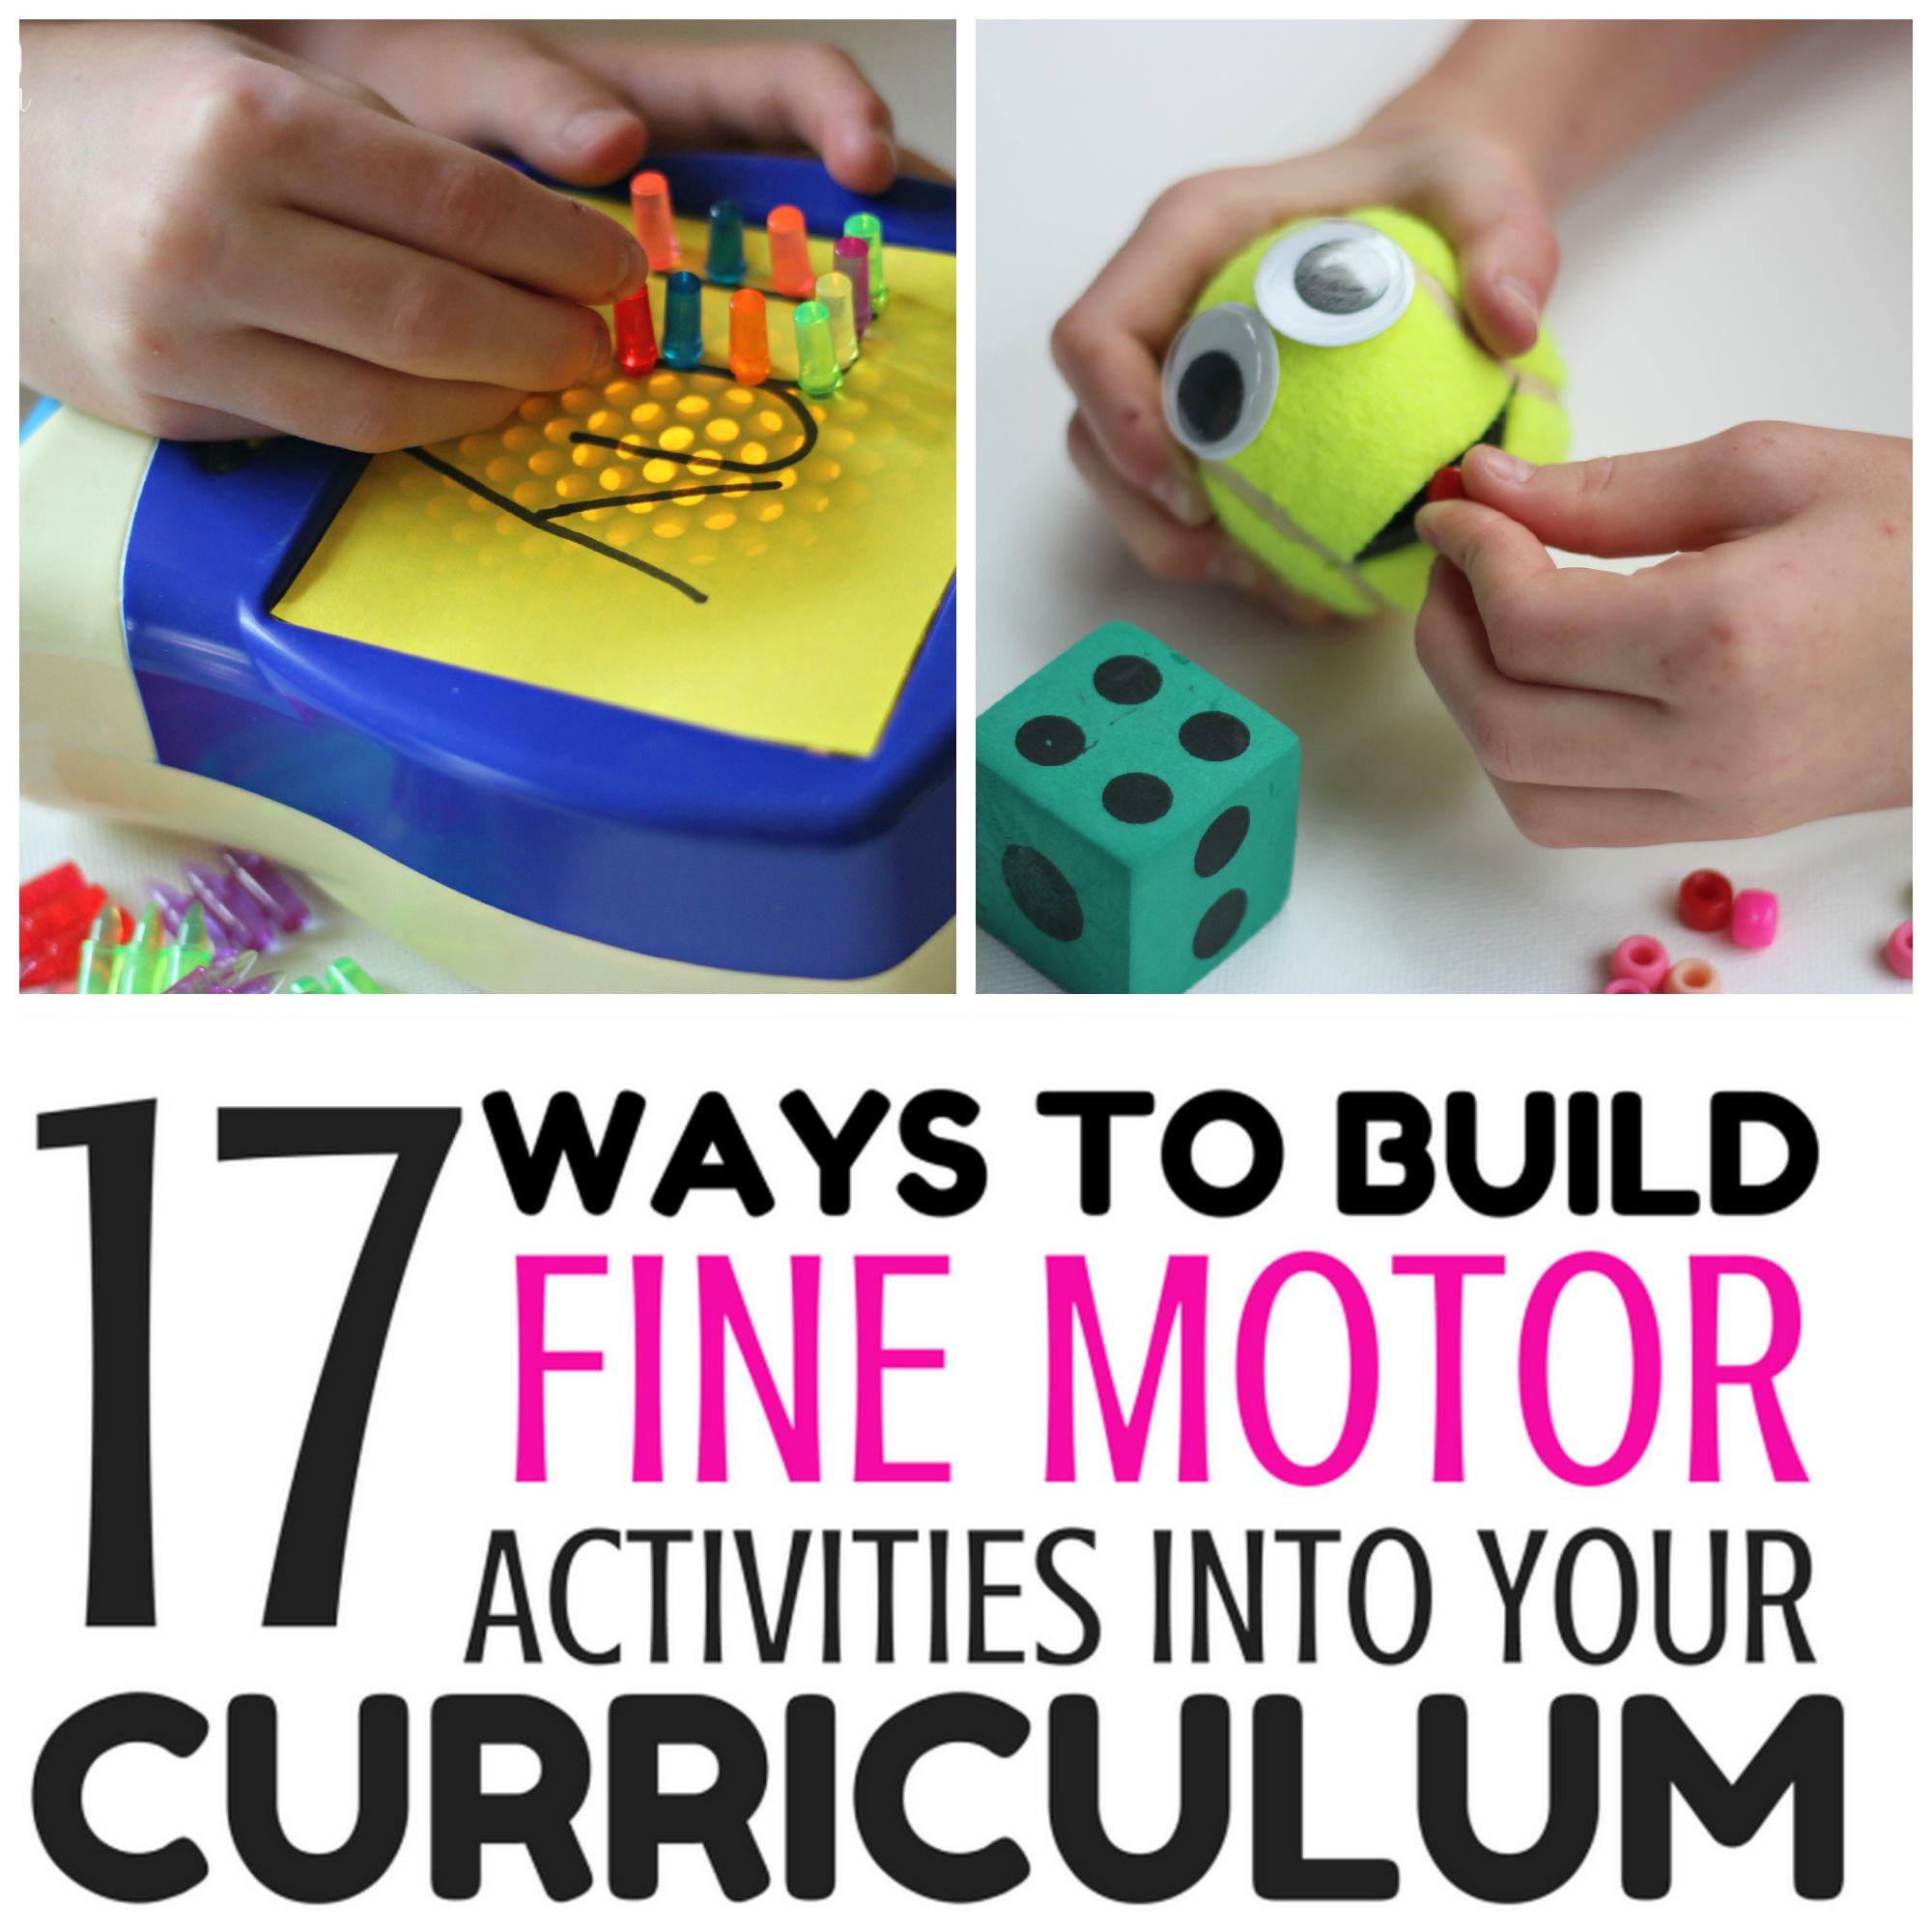 17 Ways To Build Fine Motor Activities Into Your